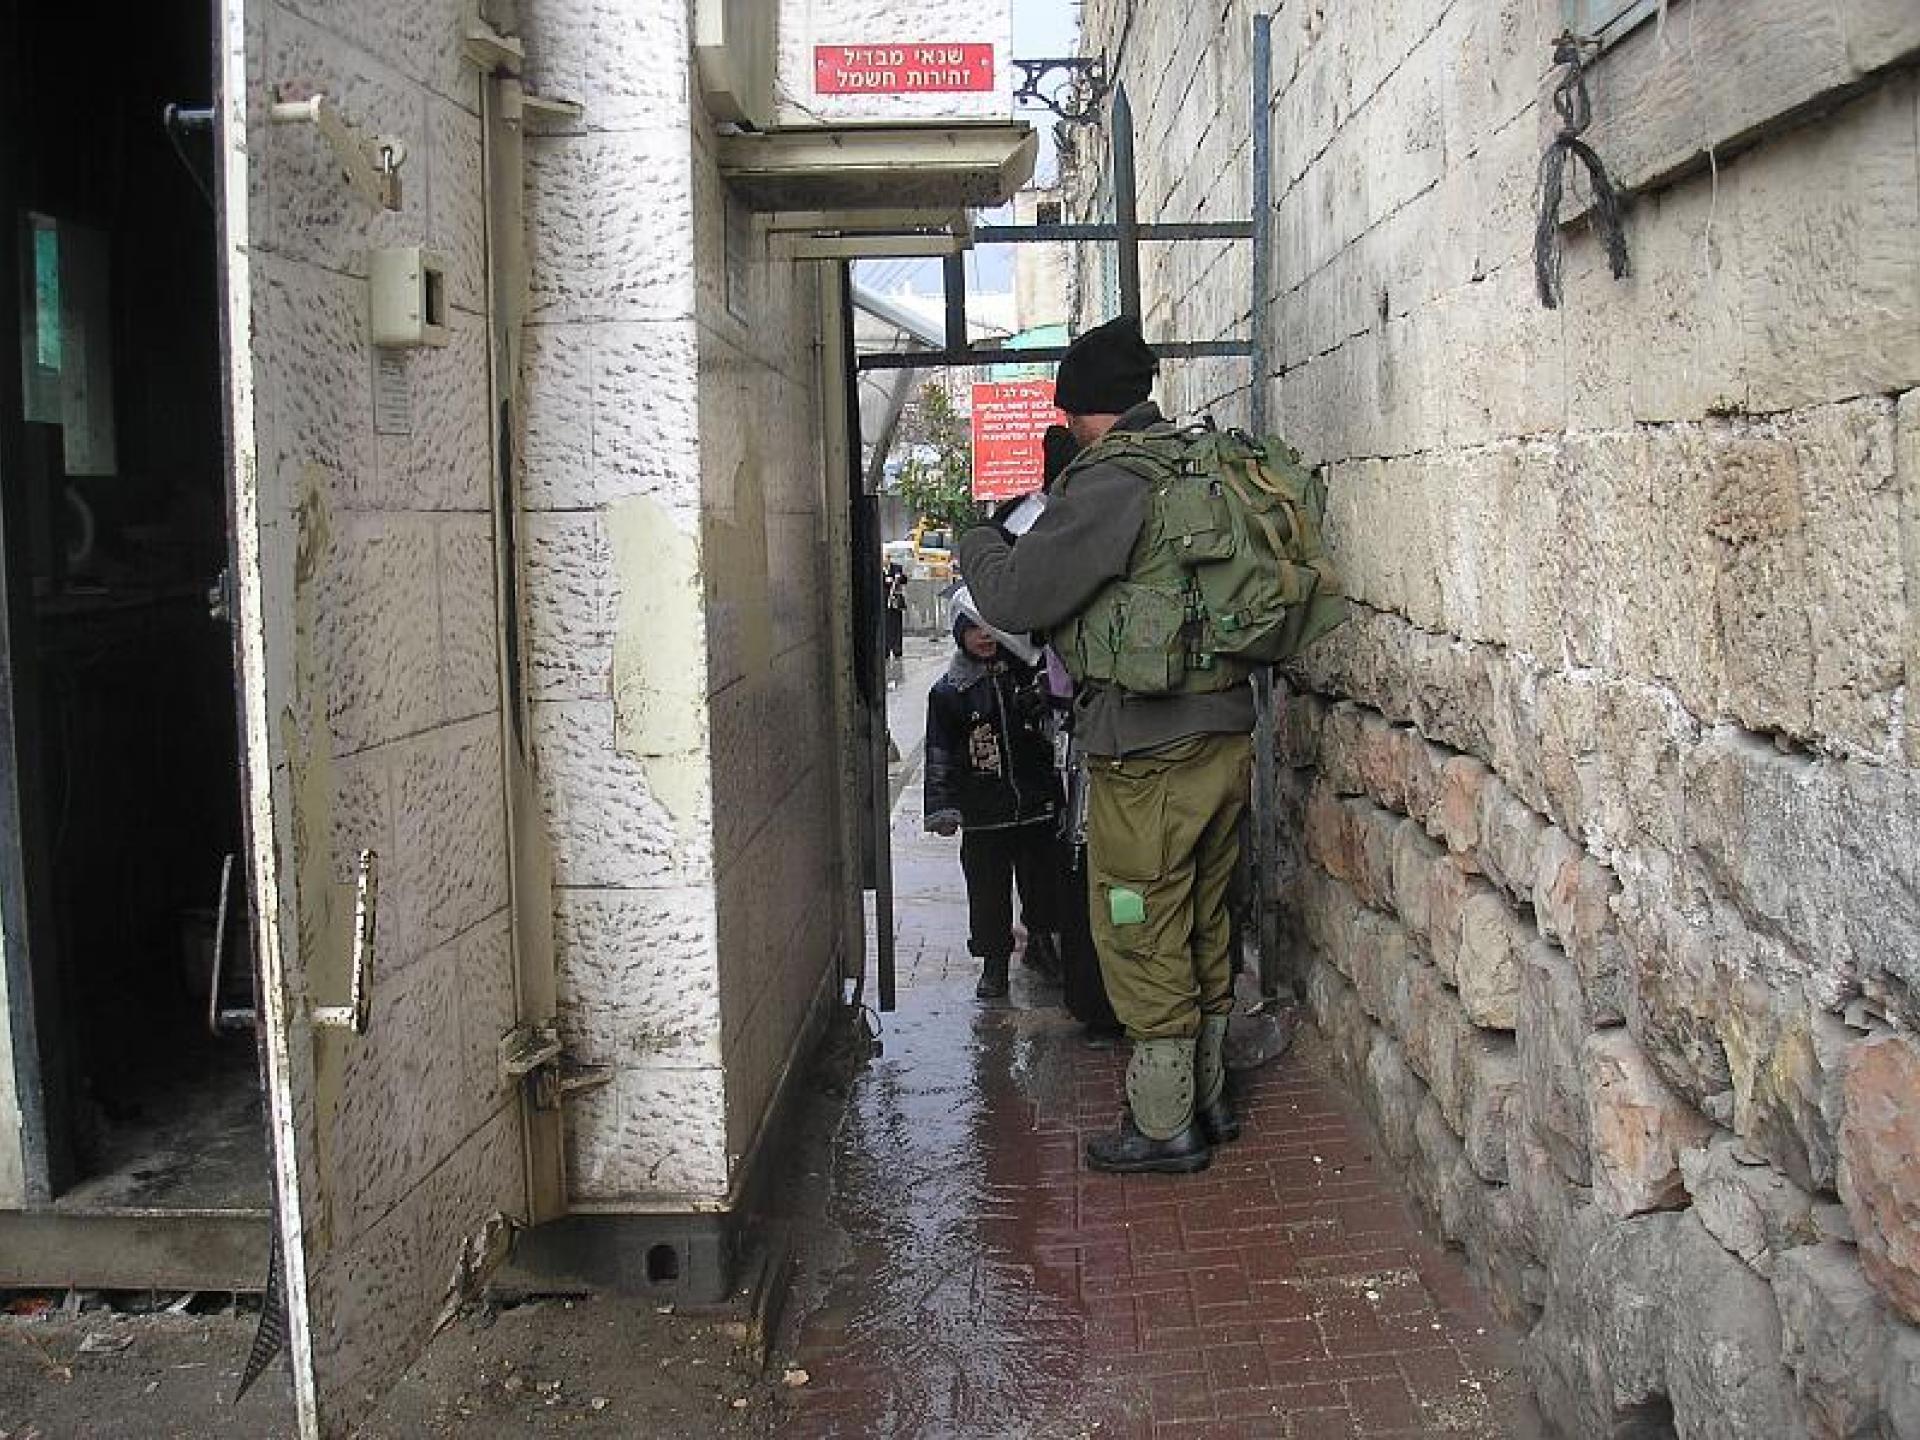 Hebron 17.02.09